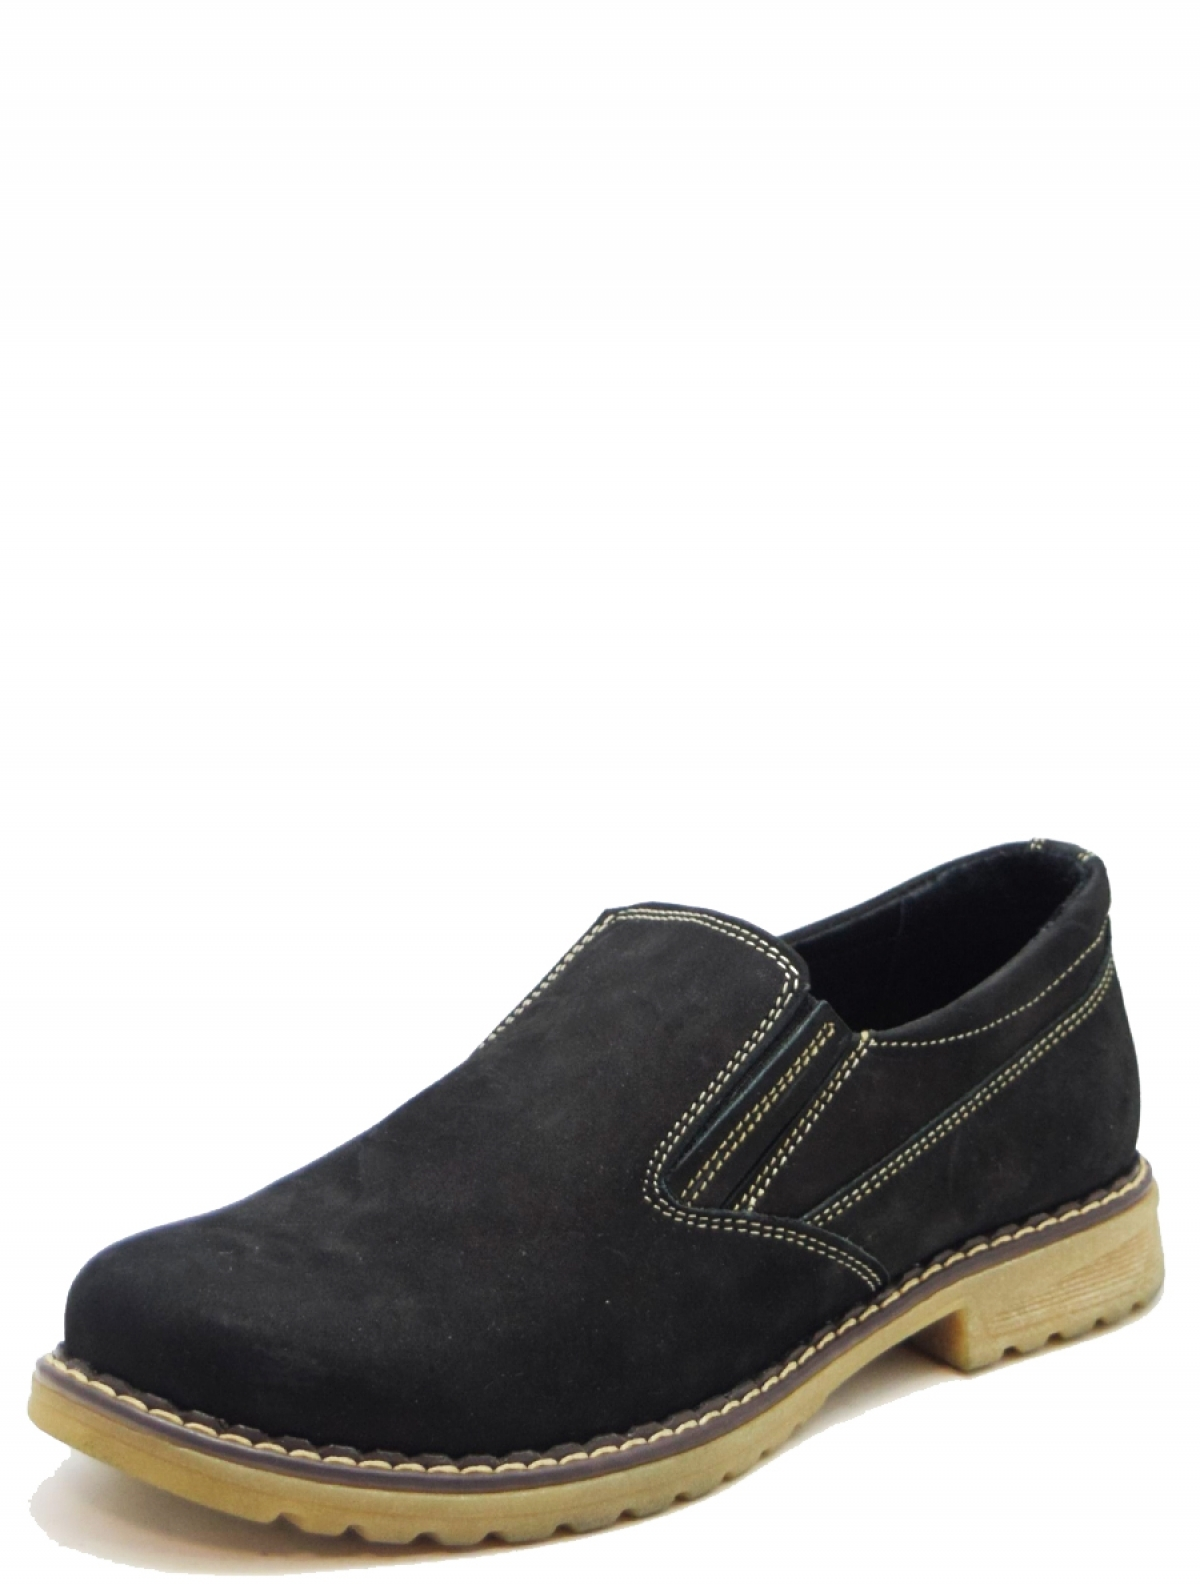 Vikont 714/1 детские туфли